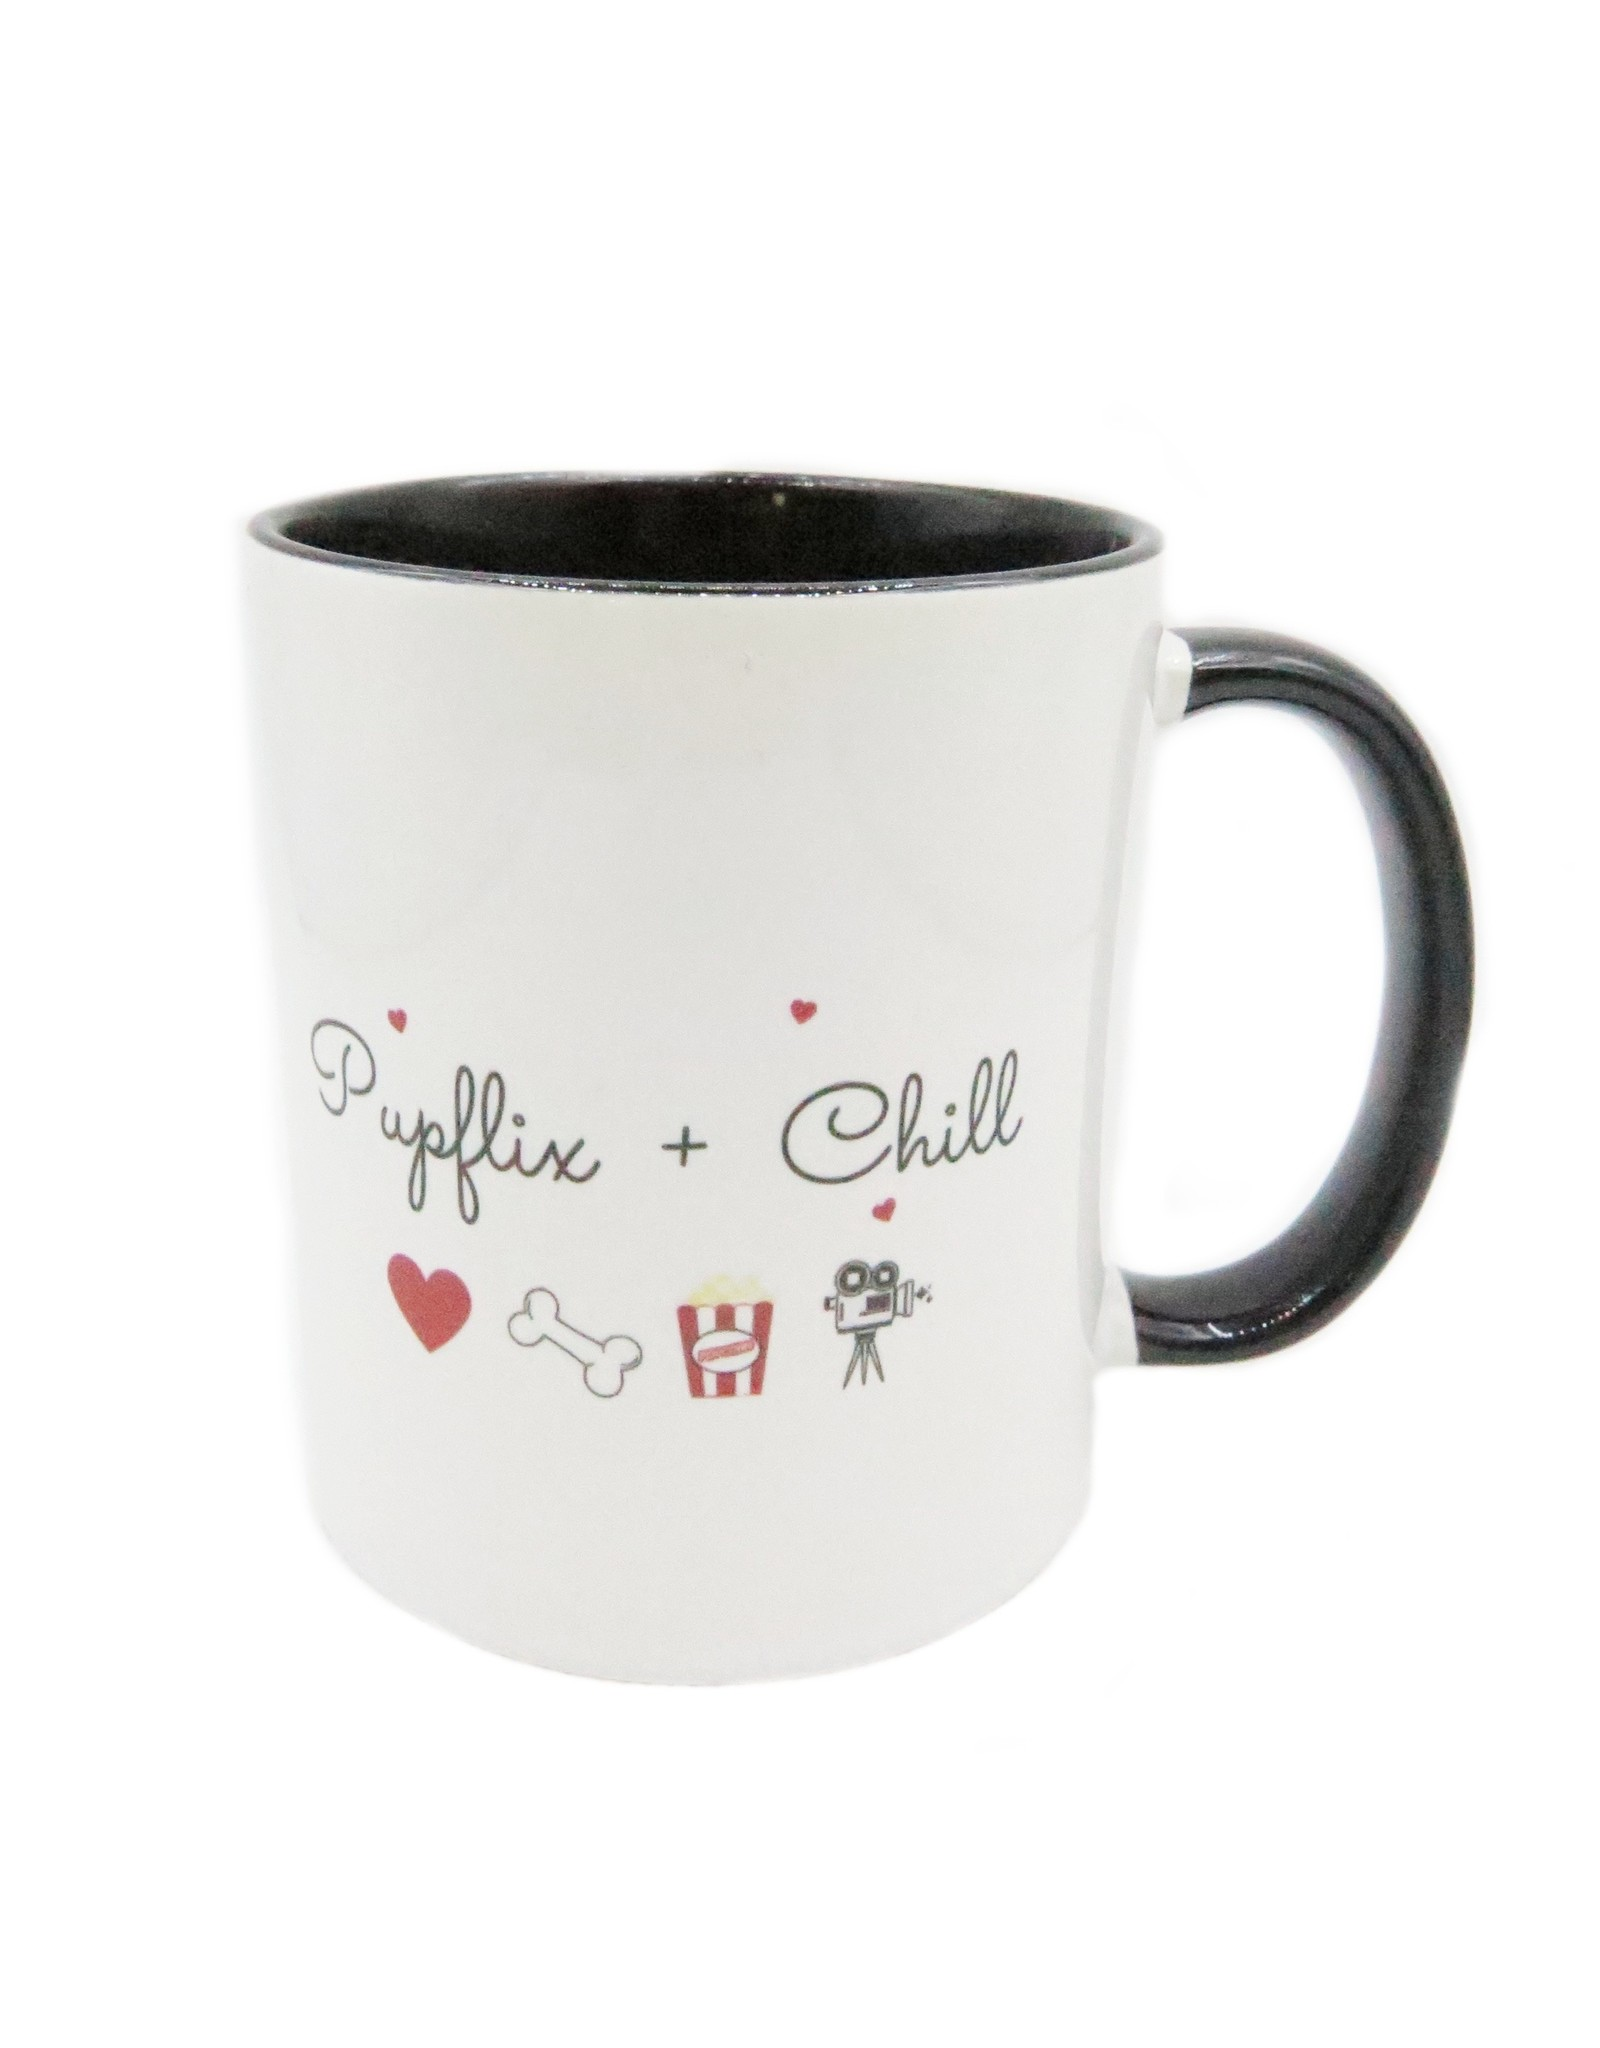 Pupflix & chill black mug